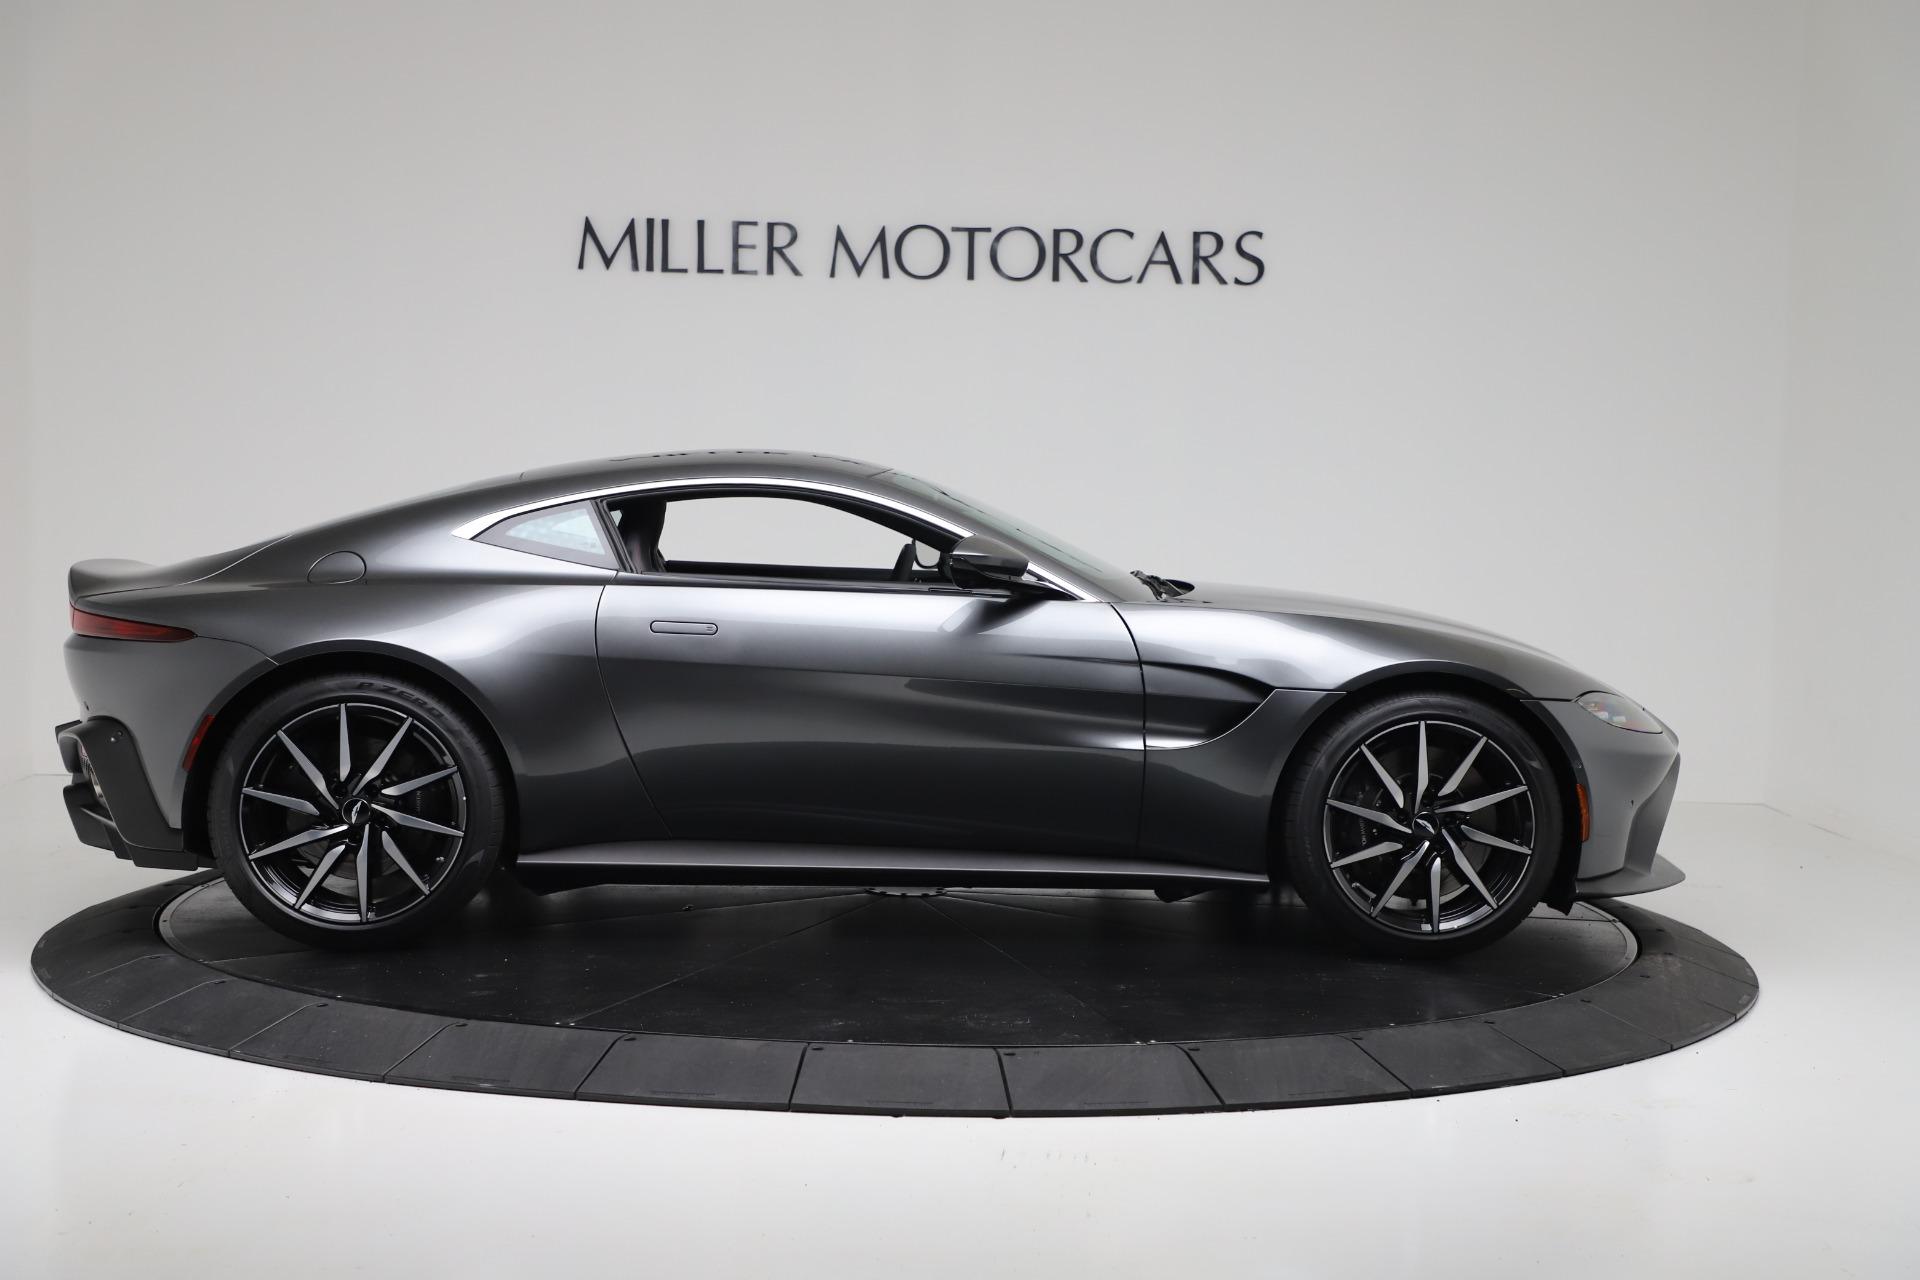 New 2020 Aston Martin Vantage V8 For Sale In Greenwich, CT 3384_p7